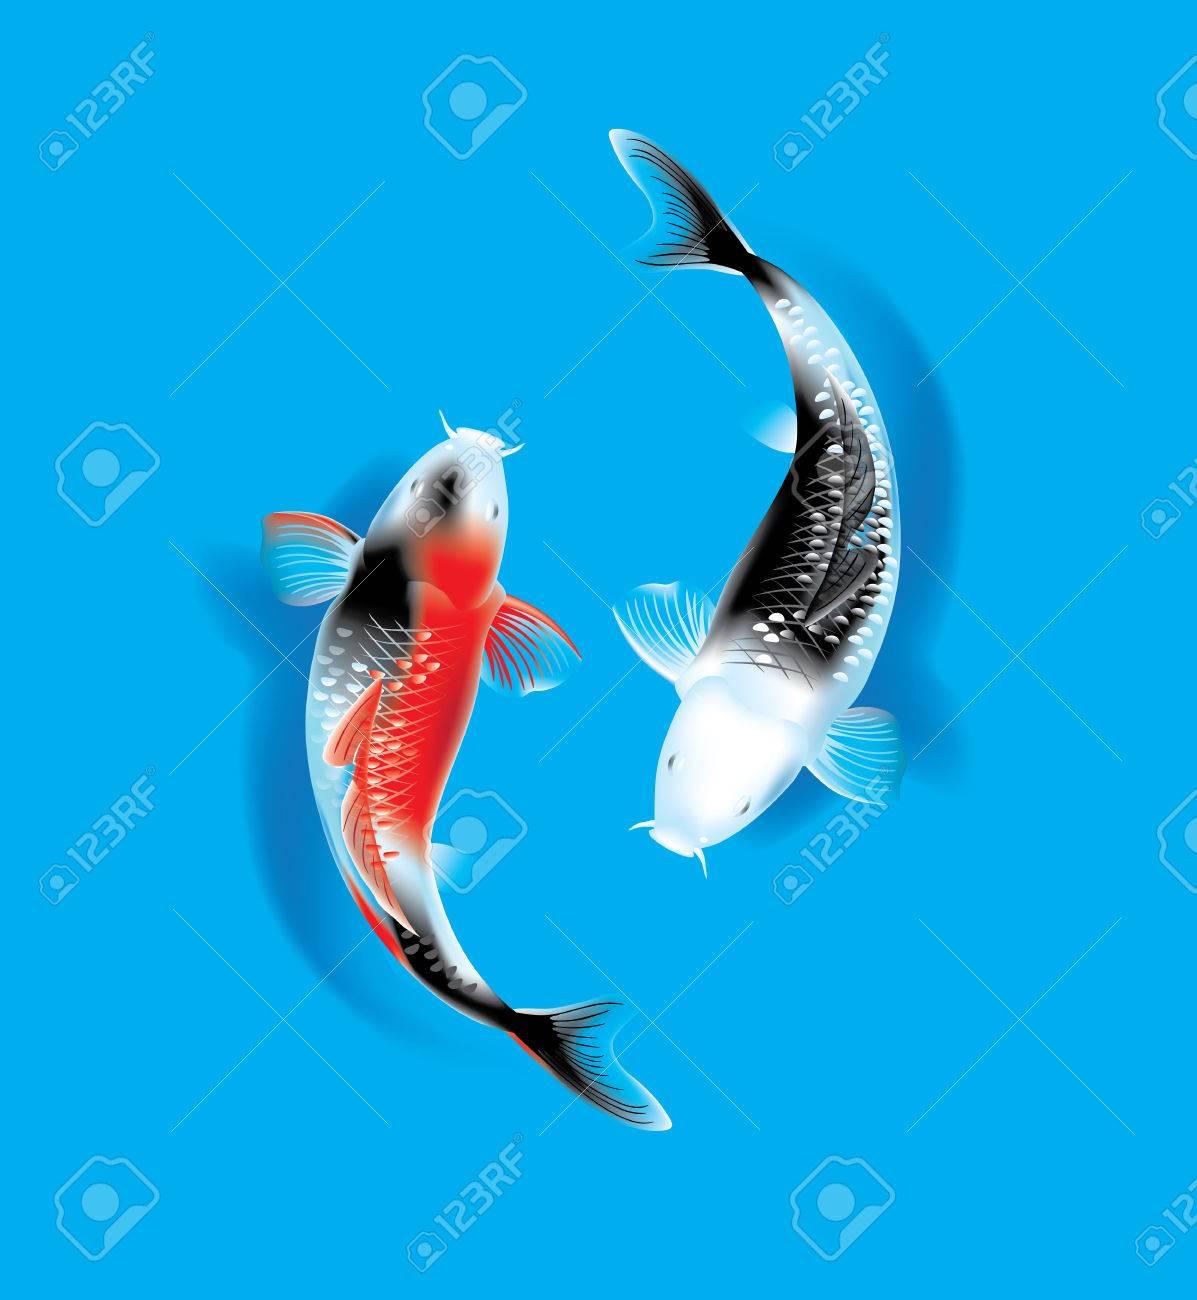 Vector Illustration Of Traditional Sacred Japanese Koi Carp Fish Royalty Free Cliparts Vectors And Stock Illustration Image 52899626